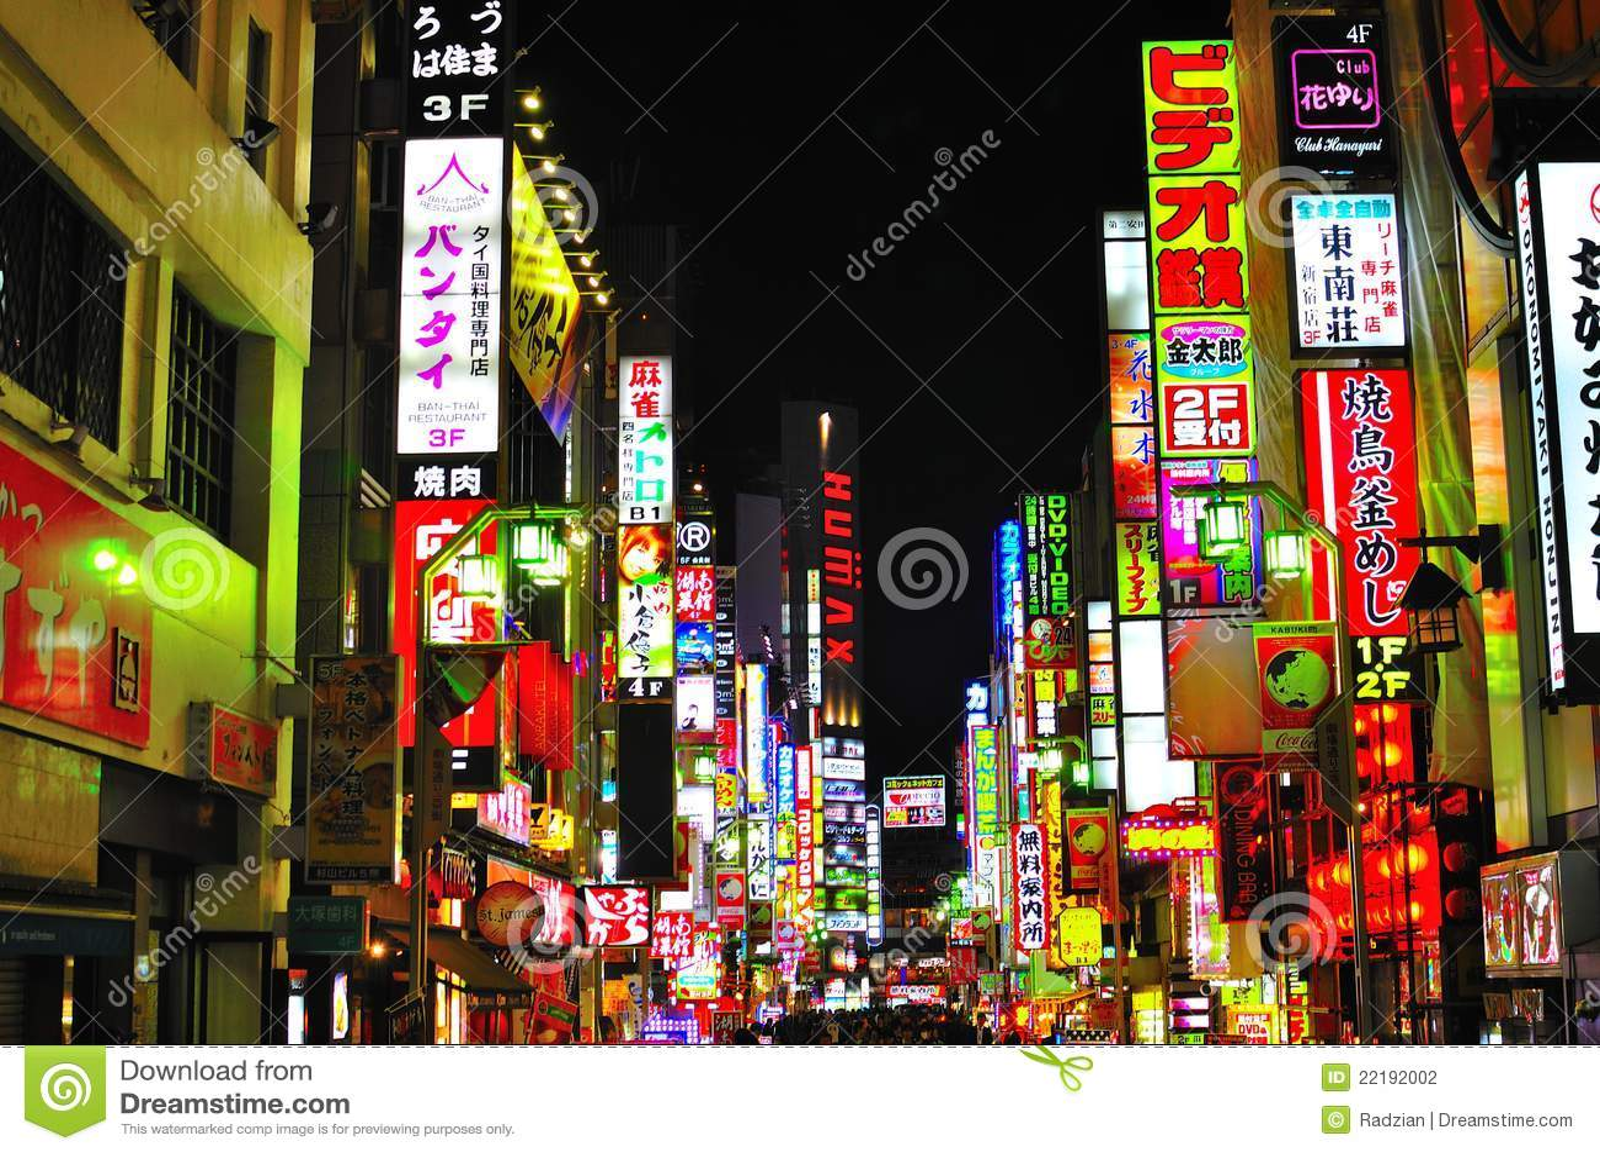 Tokyo Red Light District